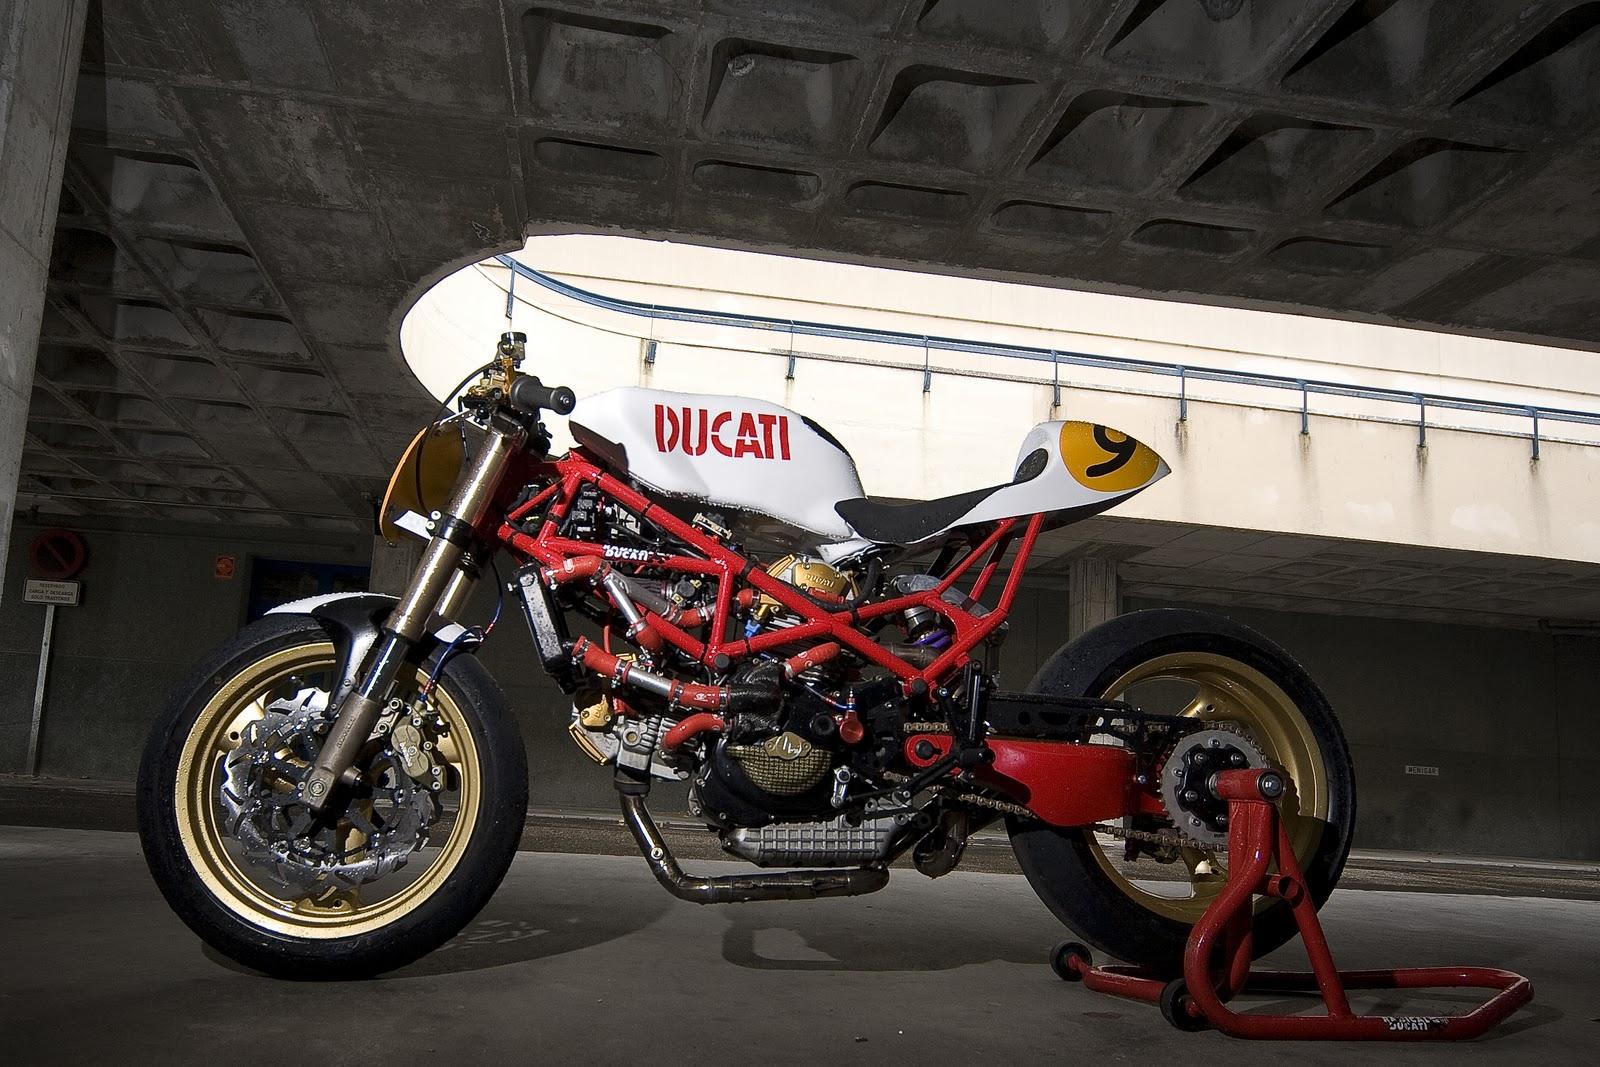 Radical Ducati S L 9 frac12 Radical